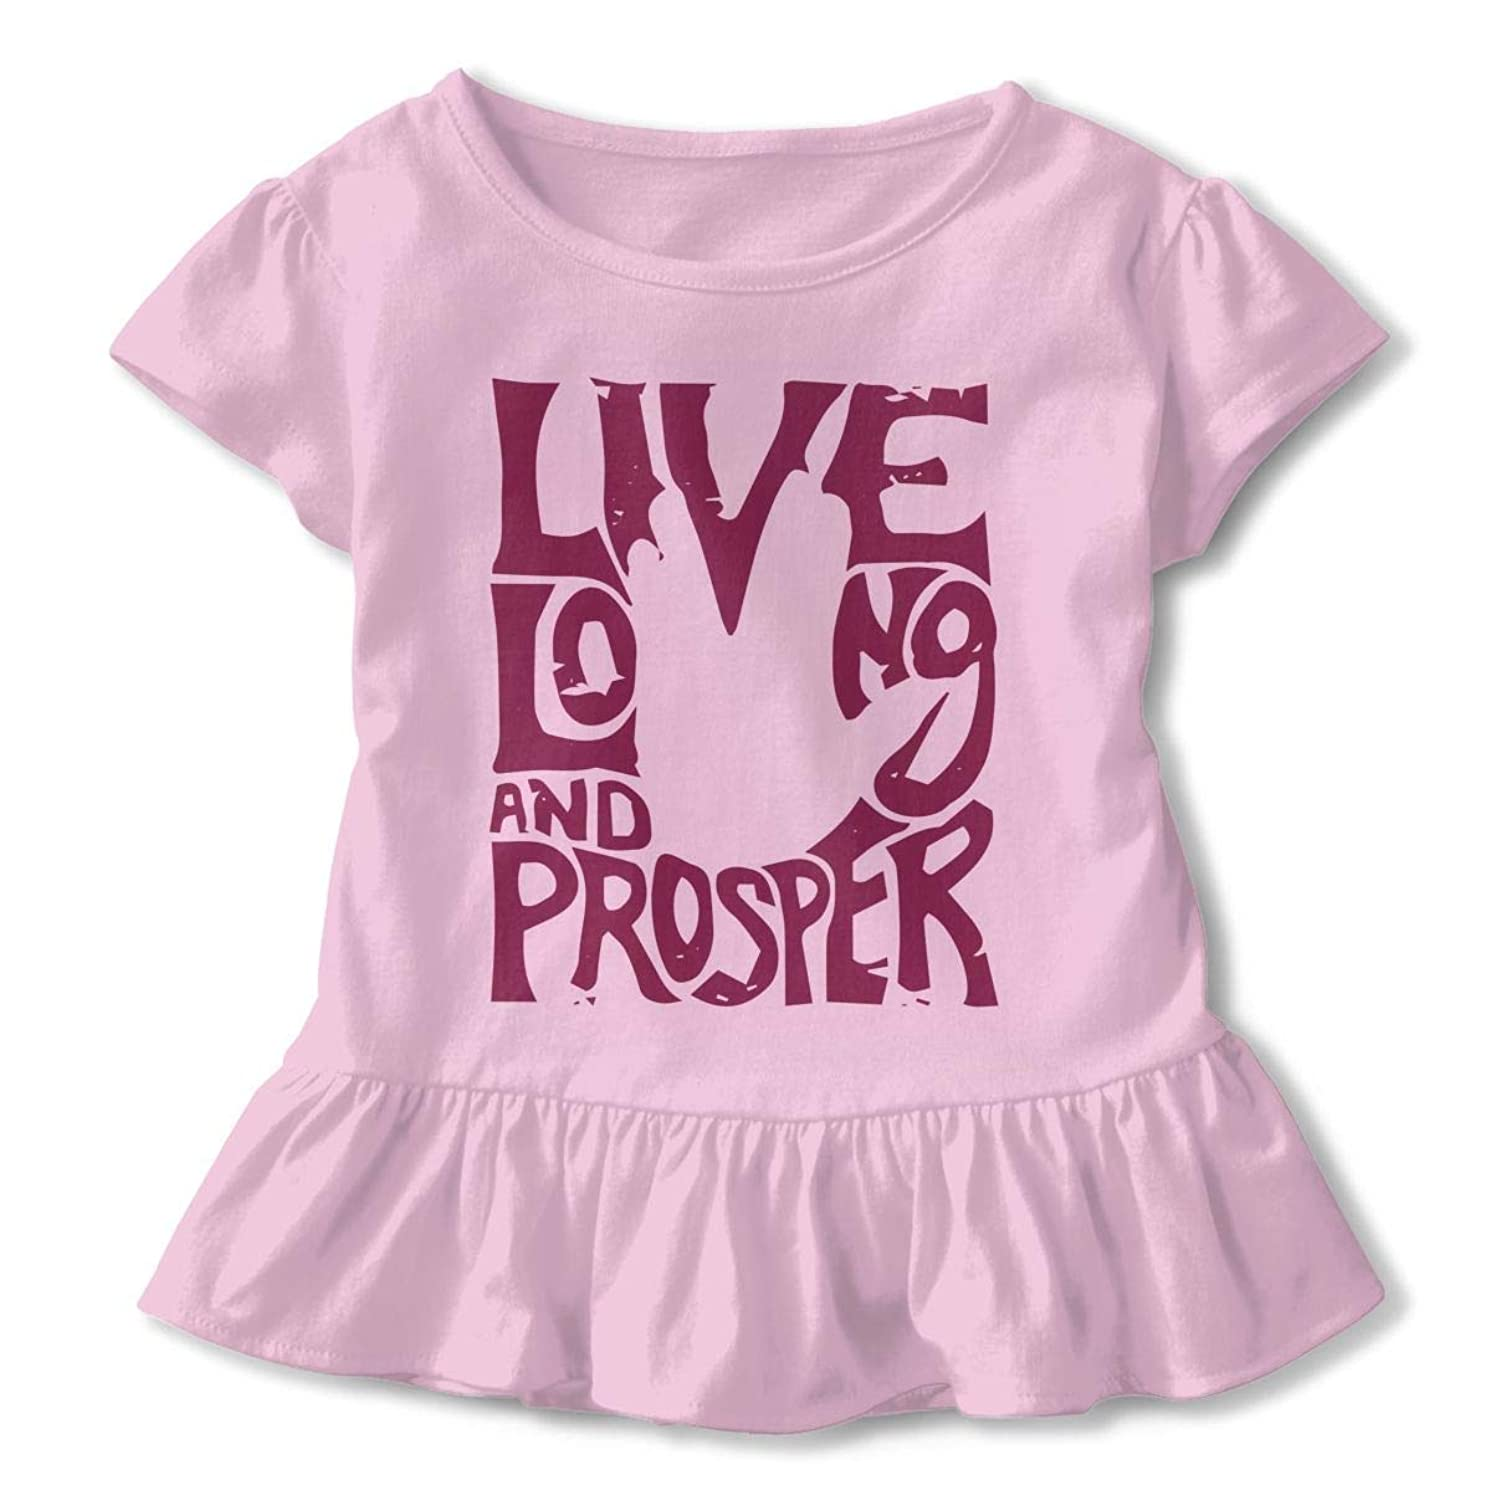 SDHEIJKY Live Long and Prosper Baby Girl Ruffle T-Shirt Halloween Thanksgiving Christmas Birthday Present 2-6T Top Tee